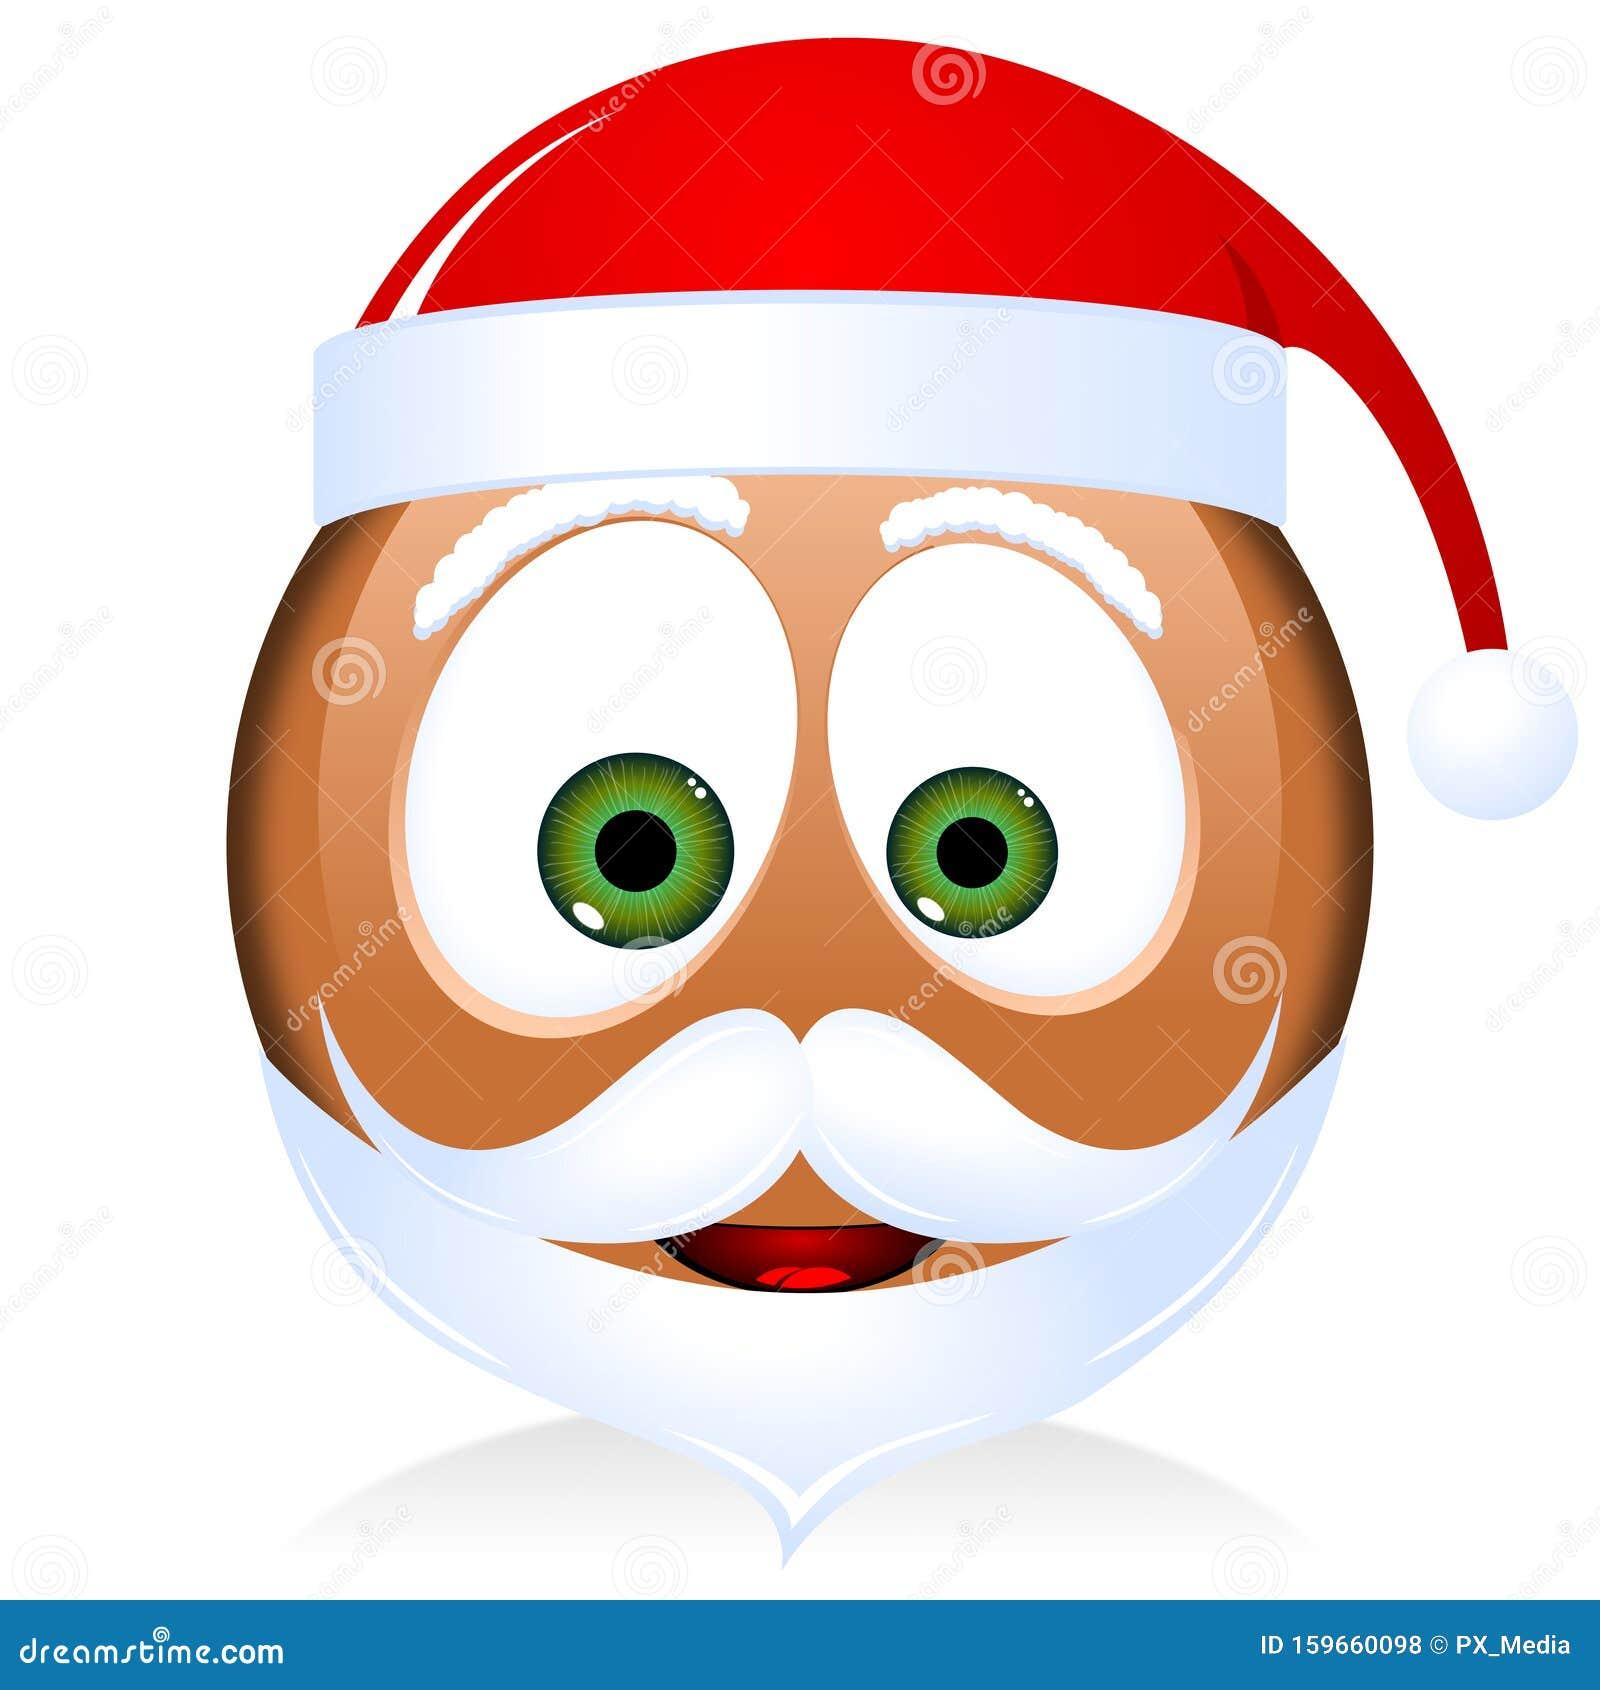 Emoticon Babbo Natale.Babbo Natale Nero Emoji Emoticon Illustrazione Di Stock Illustrazione Di Icona Santa 159660098